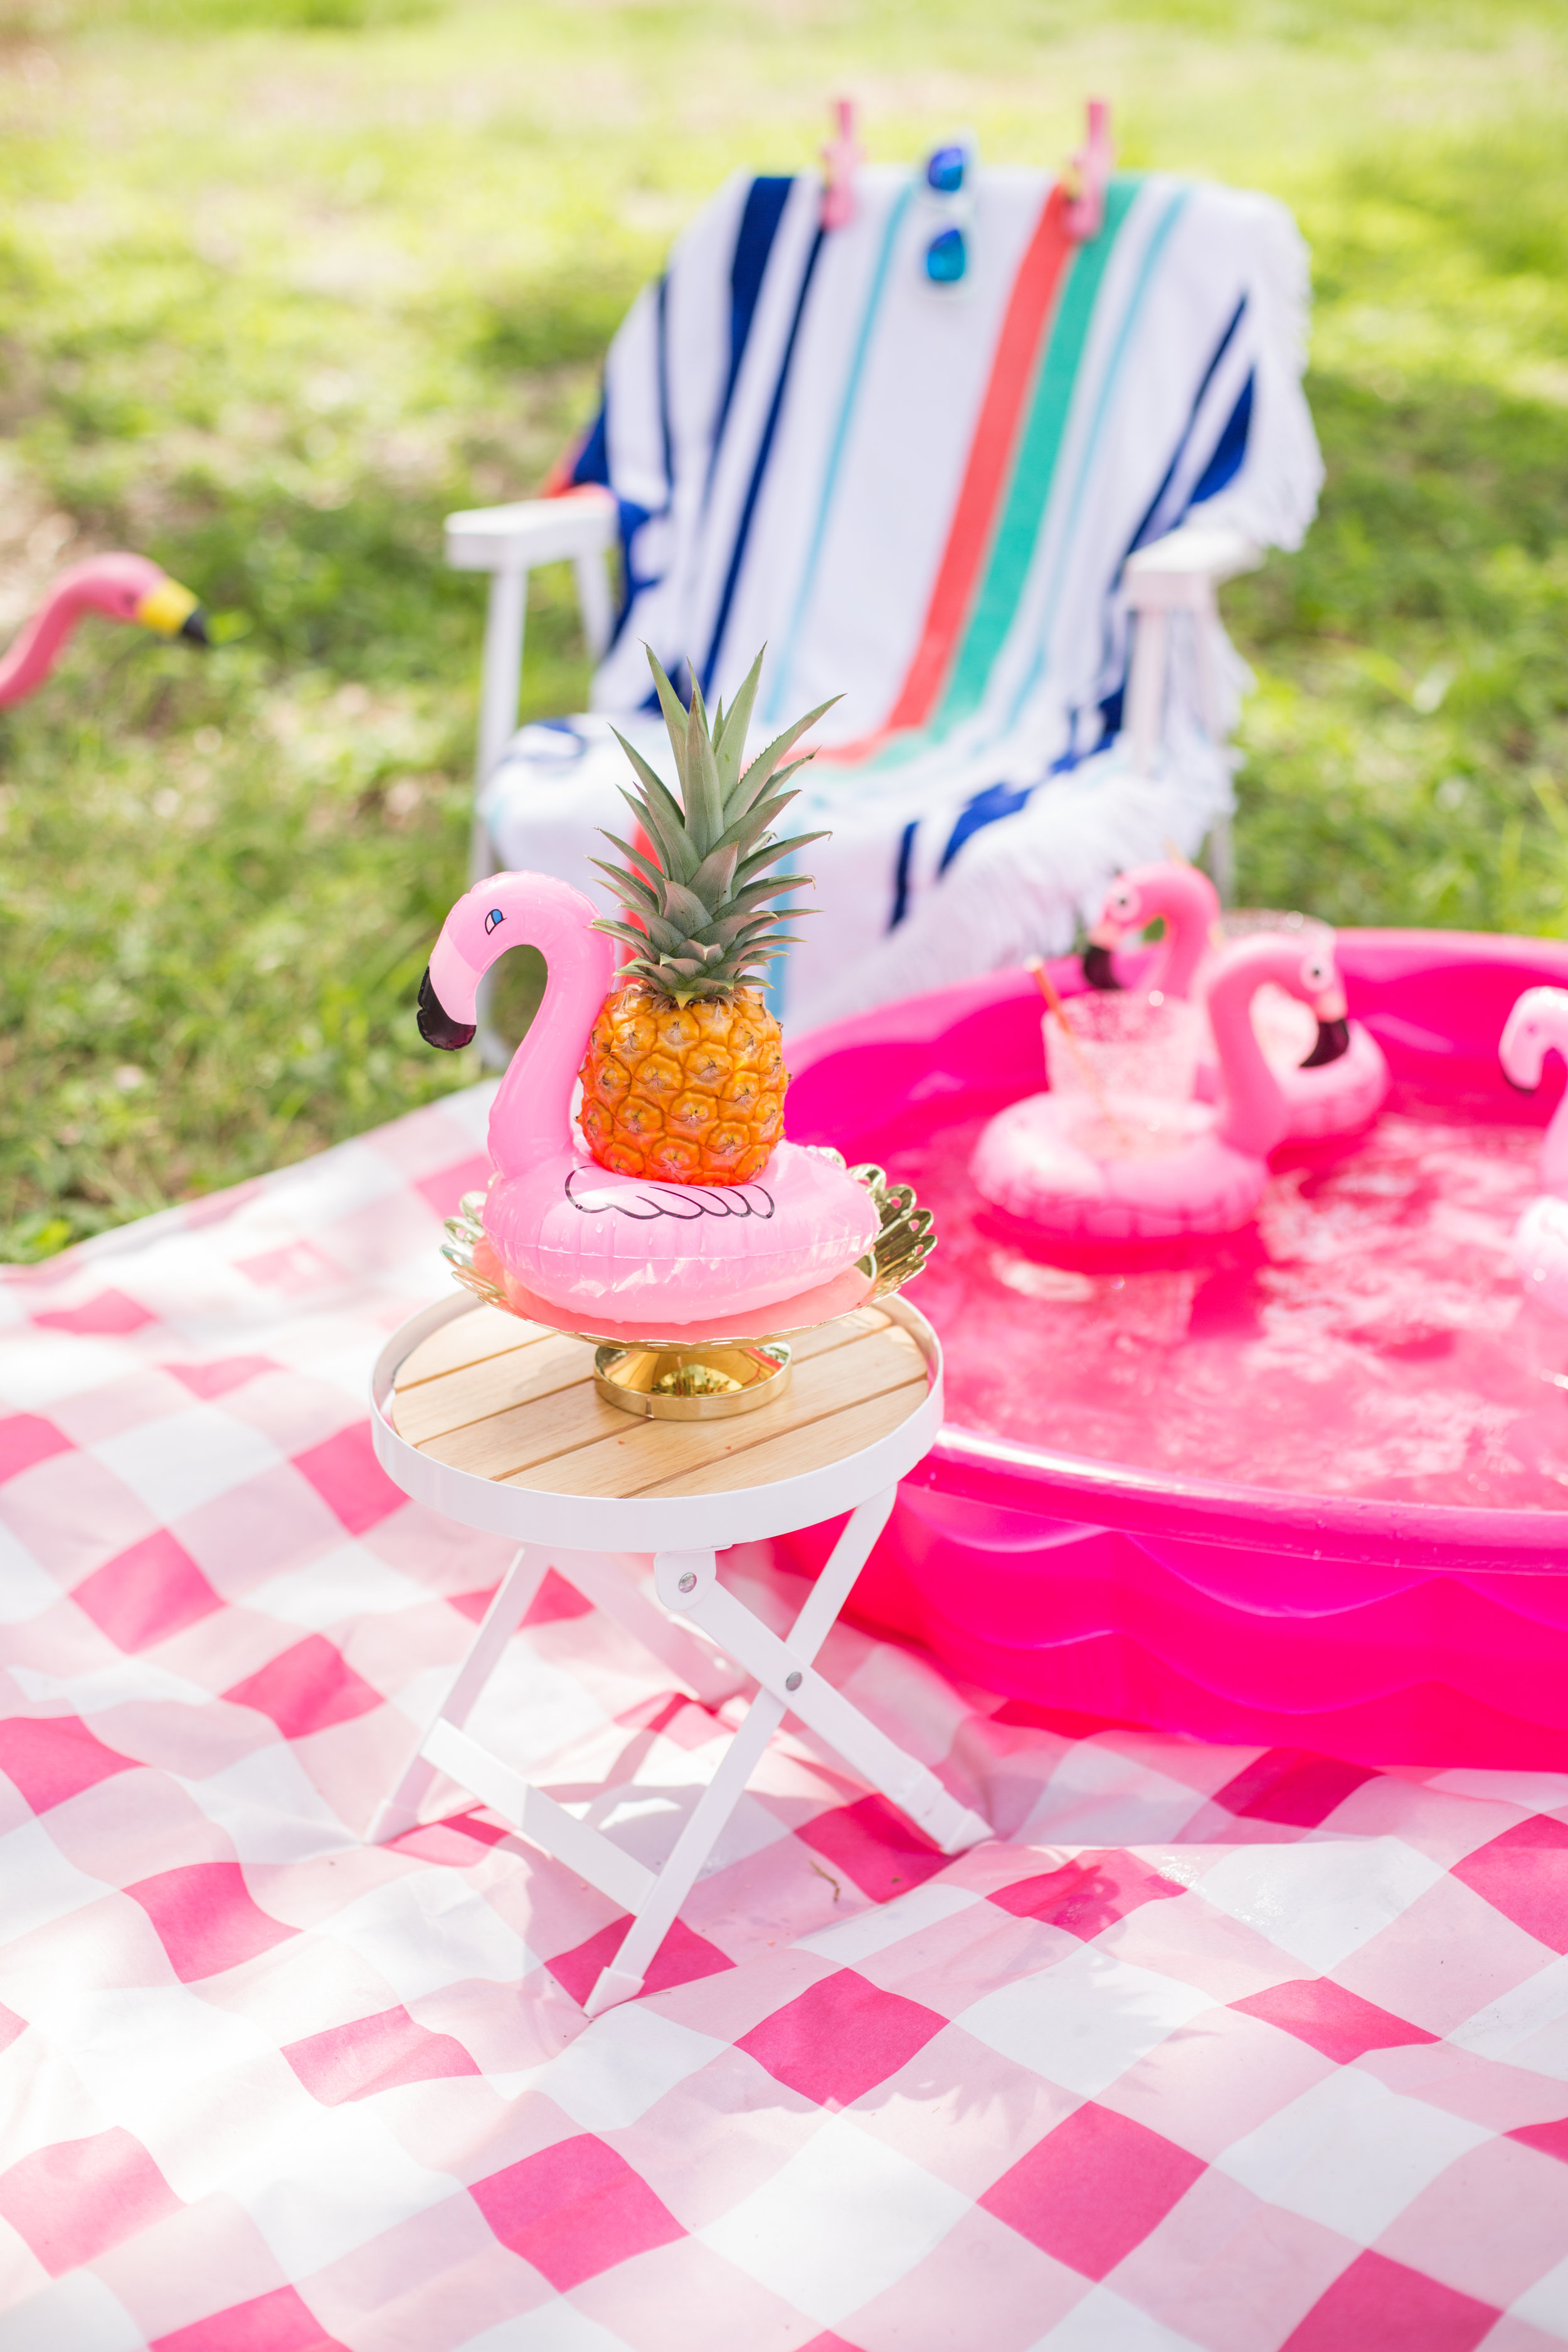 philippe_park_flamingo_photo_session_summer